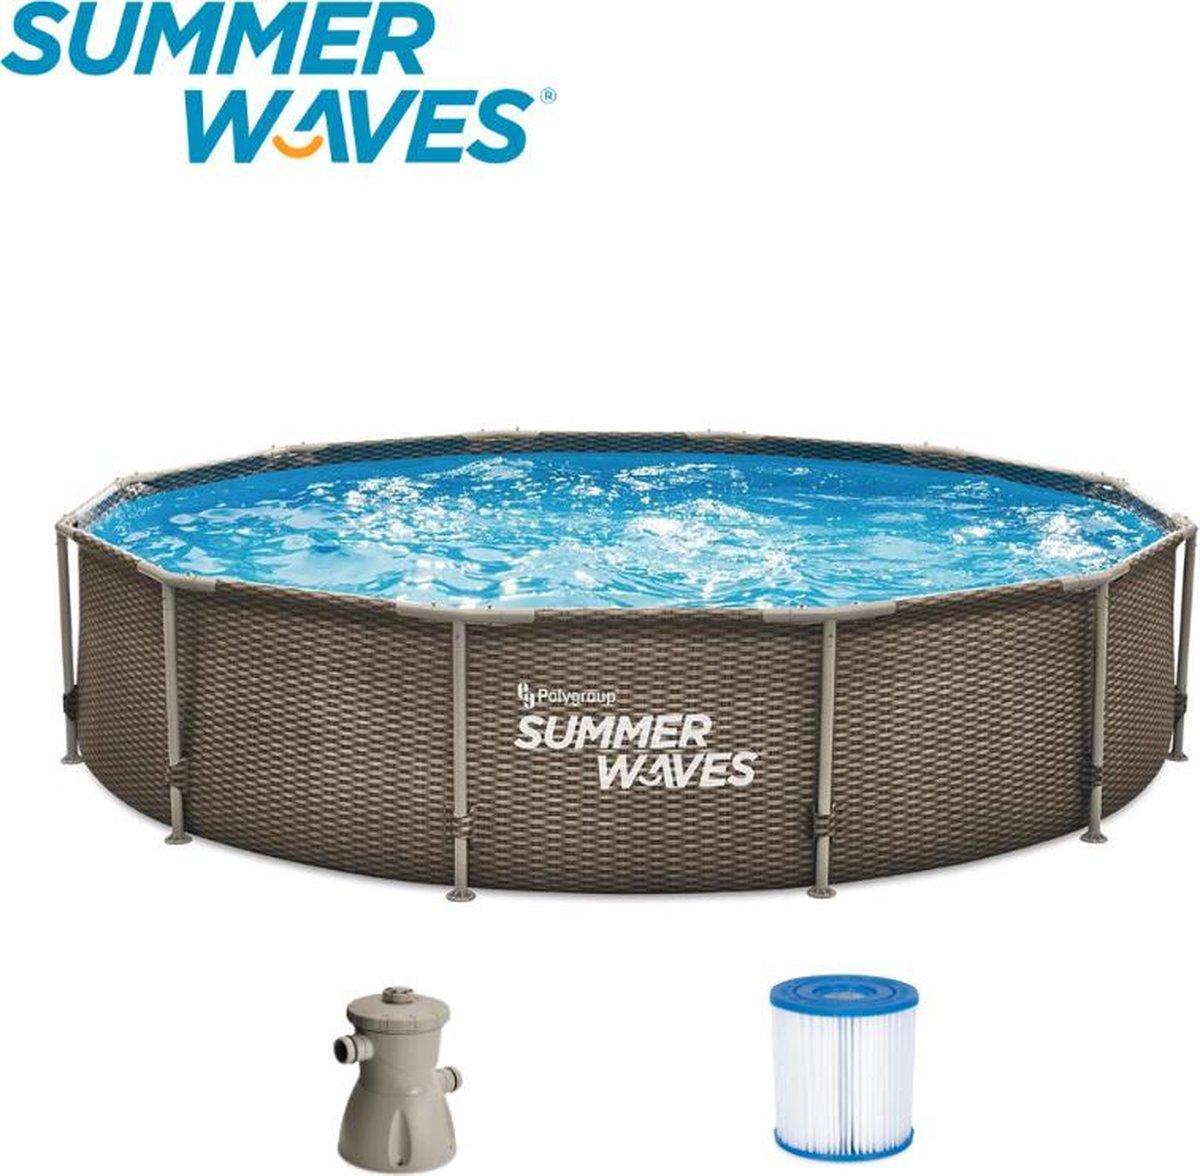 Summer Waves Frame Zwembad   Rotan l Look   Ø 366 cm x 76 xm   Inclusief Filterpomp   Bruin